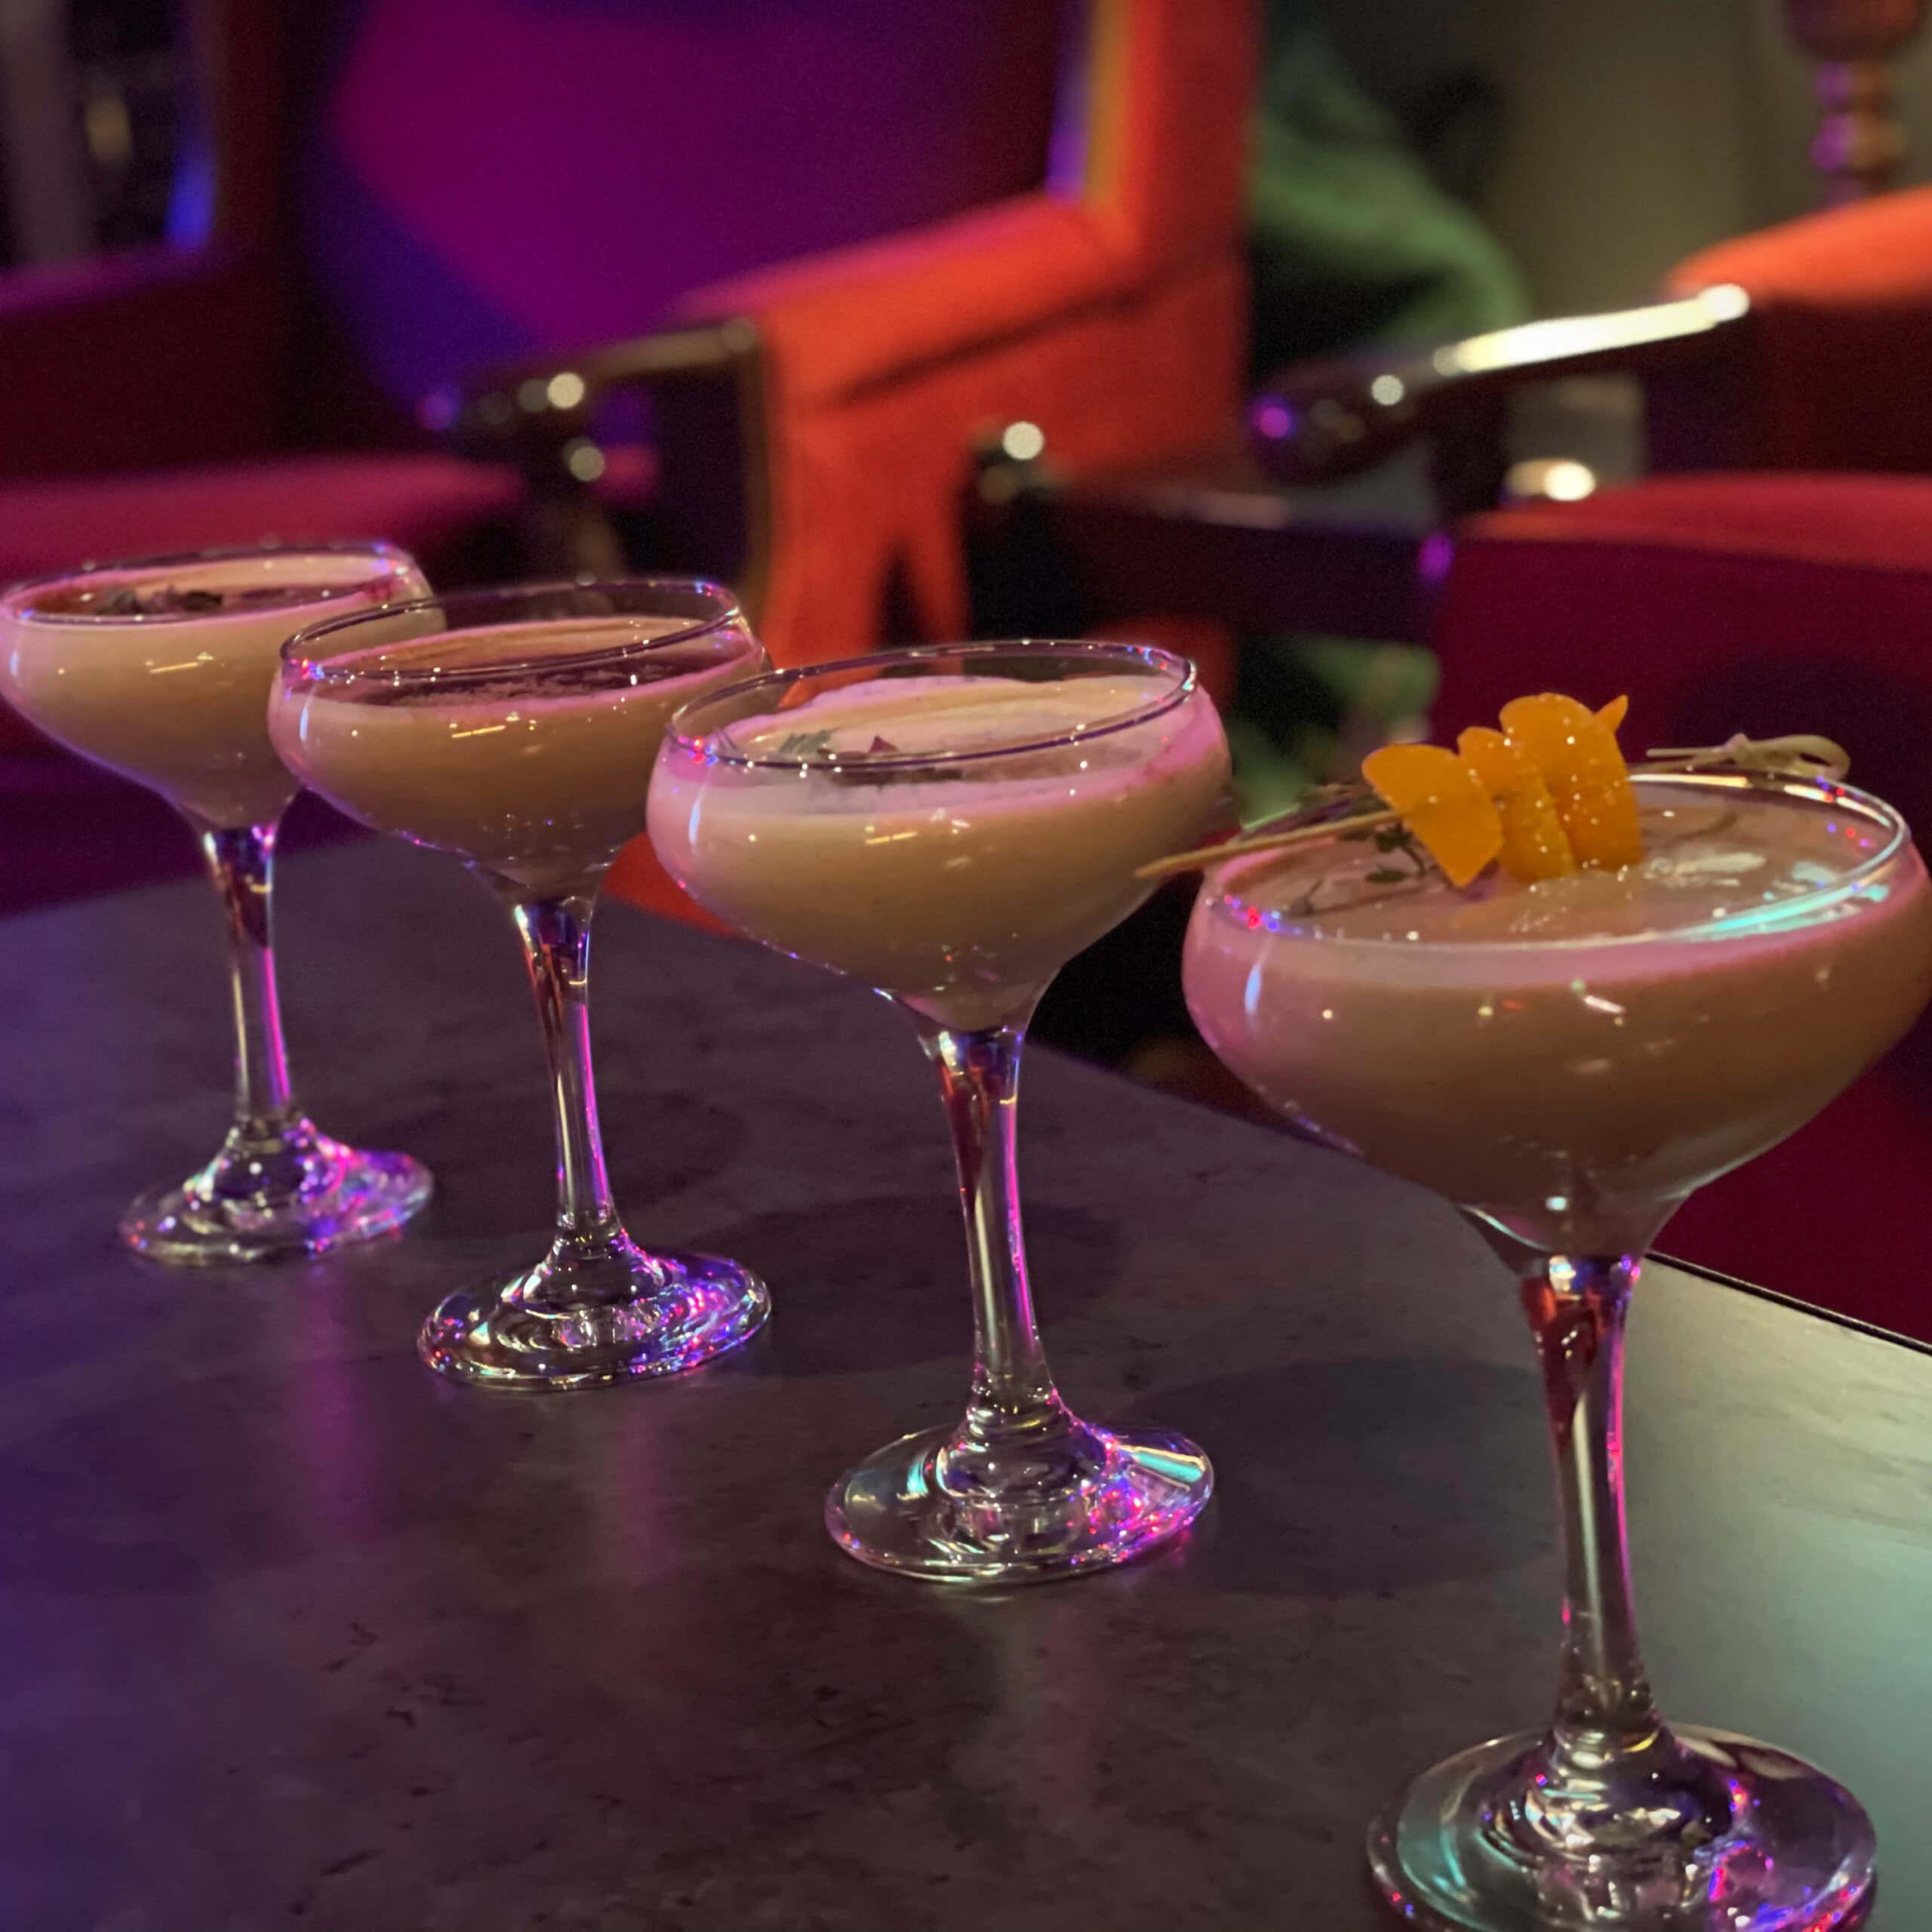 Cocktails at Jimmy Hornet